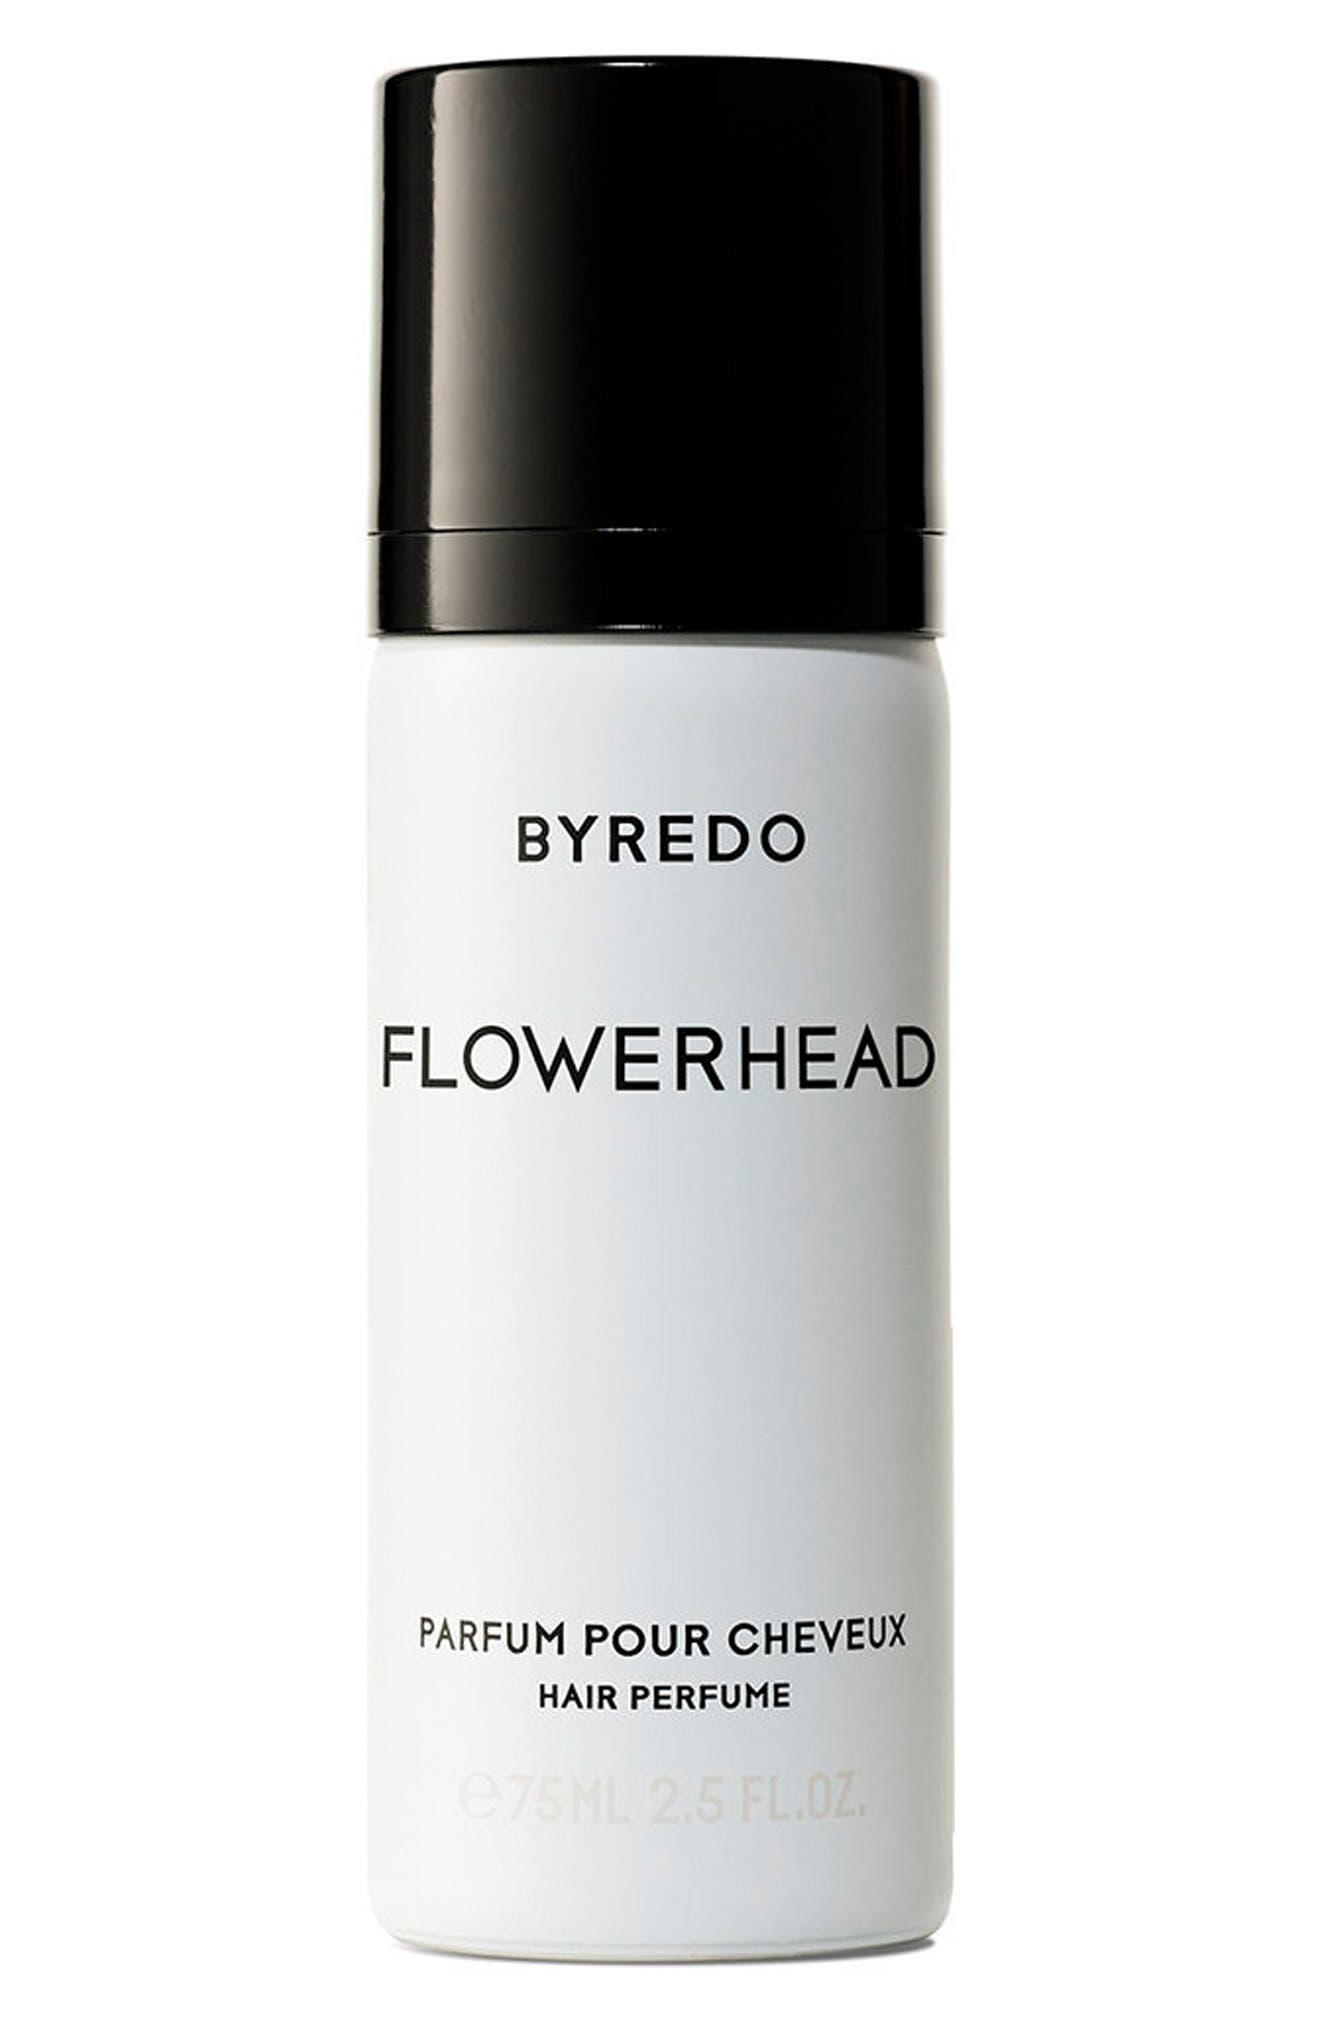 Alternate Image 1 Selected - BYREDO Flowerhead Hair Perfume